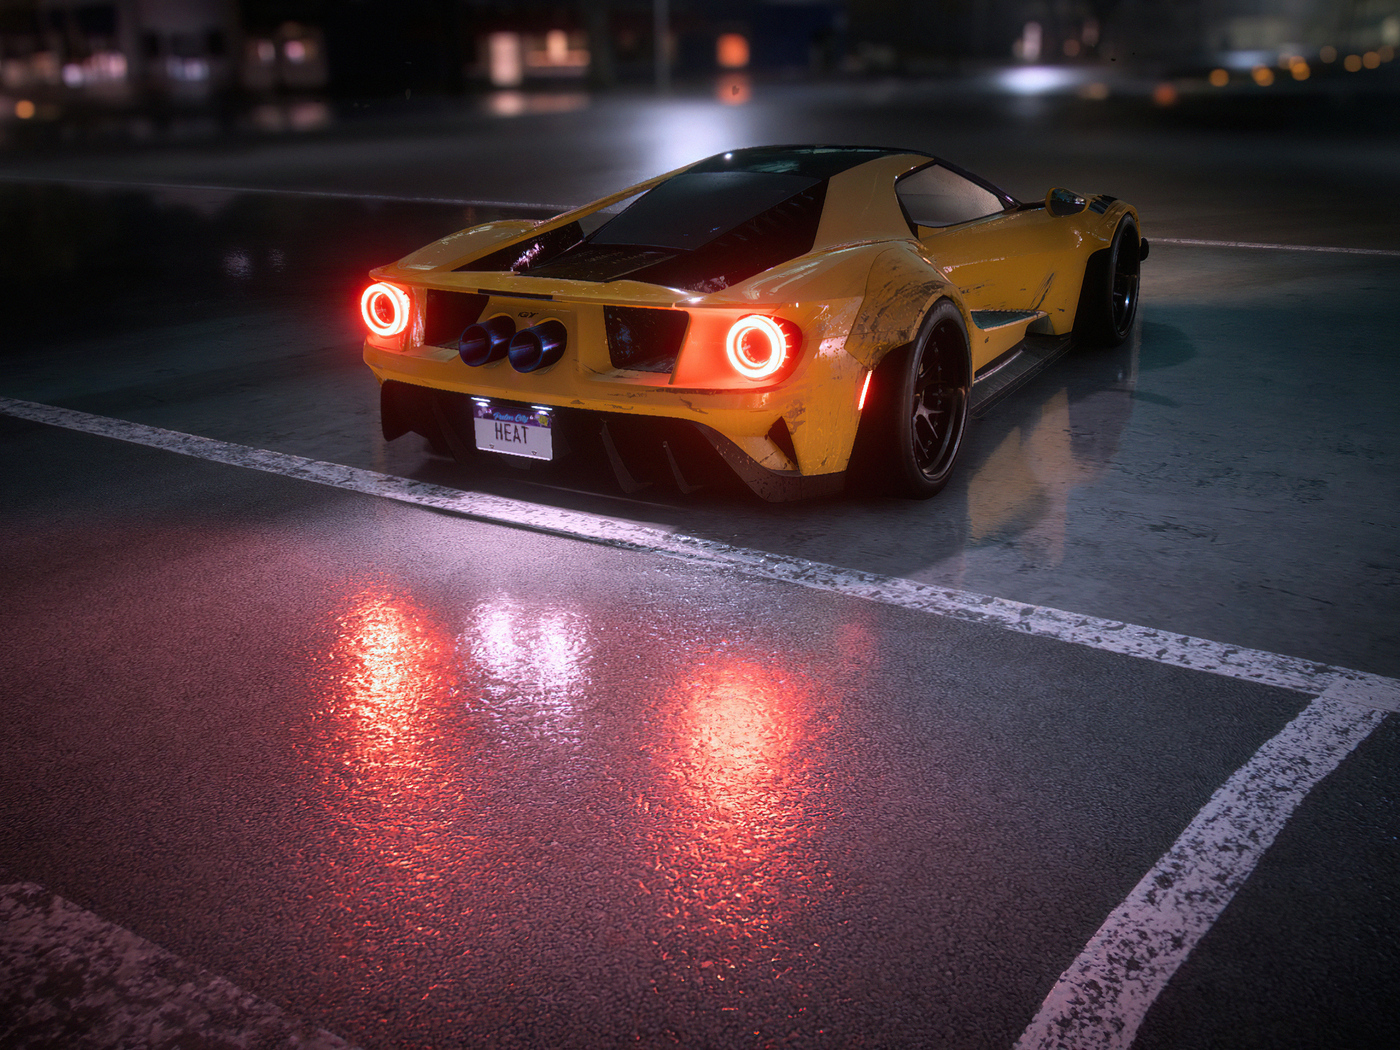 nfs-heat-ford-gt-supercar-4k-ka.jpg